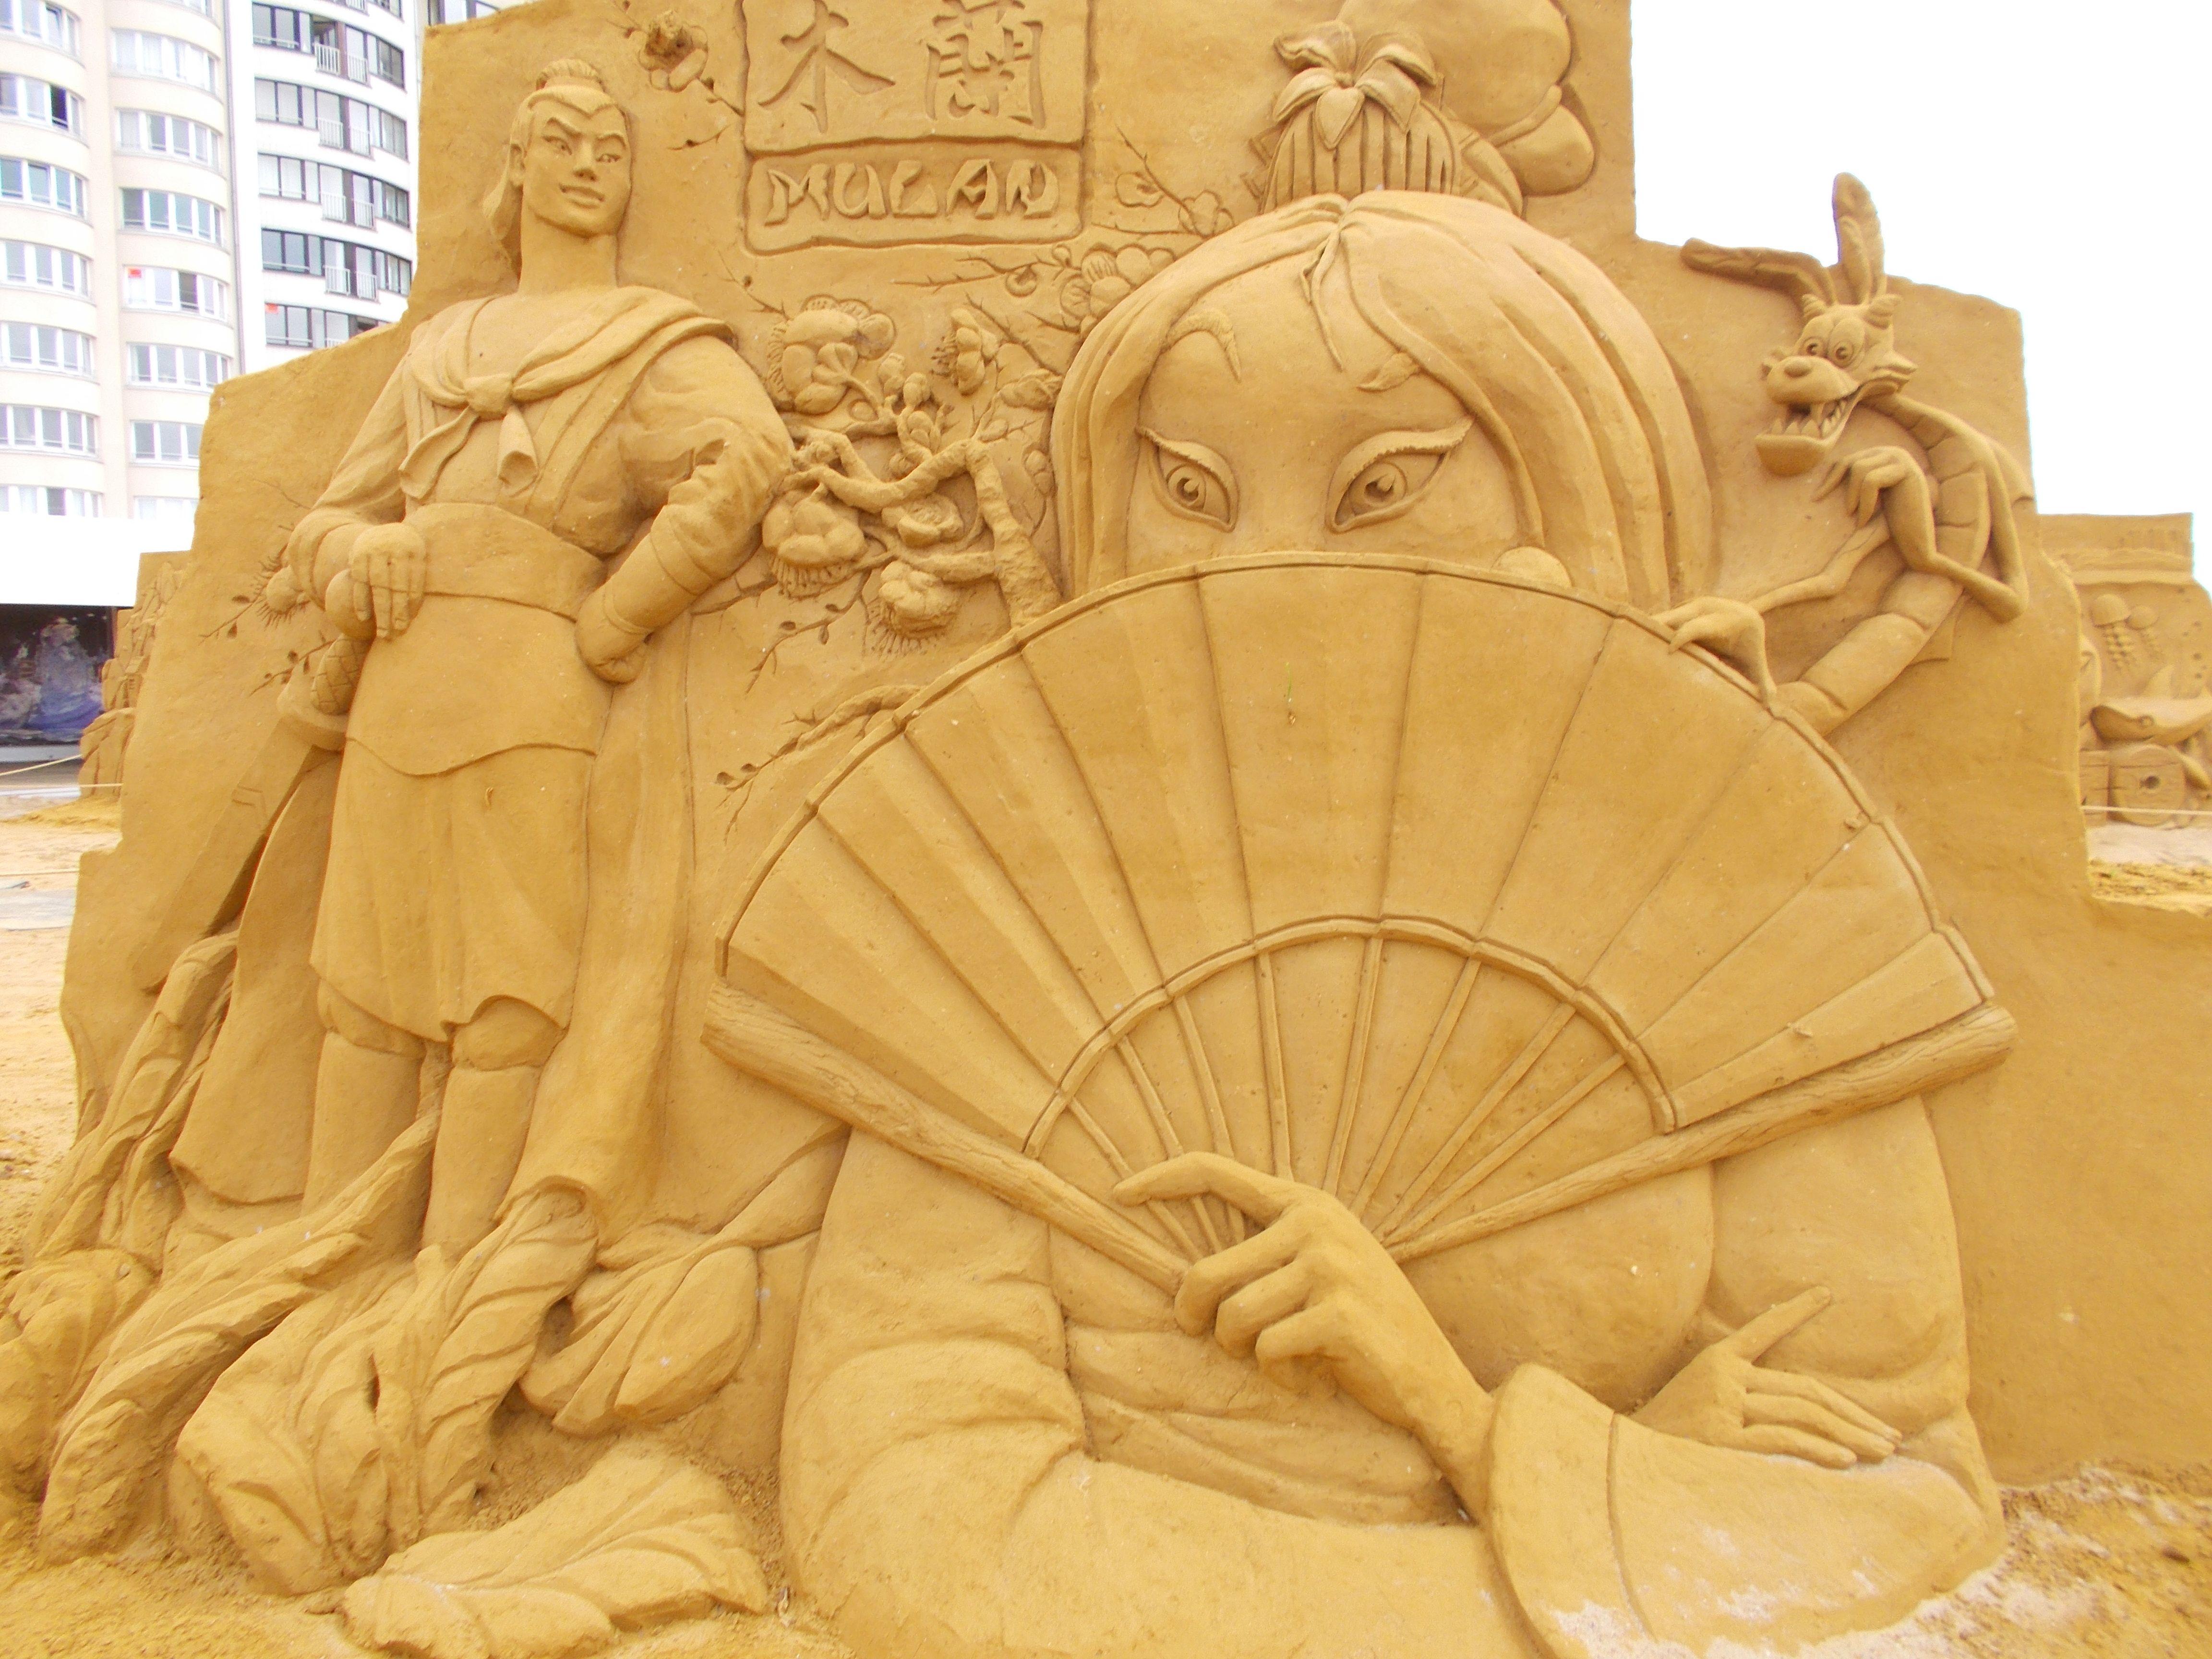 Sculpture sand-art .-Oostende 2014.-